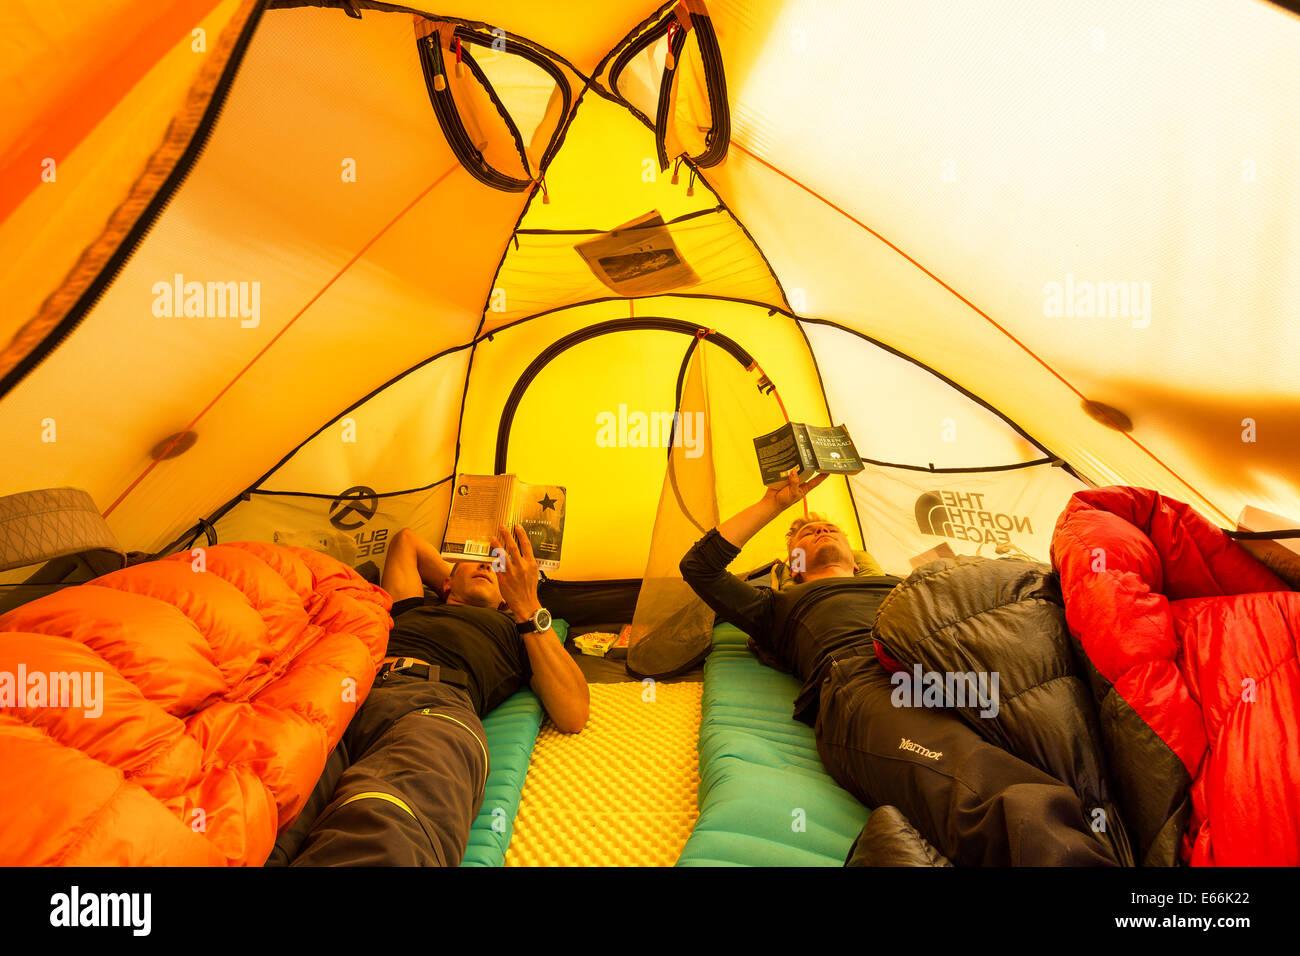 Zwischen ruht klettert im Ishinca Tal Basislager, Cordillera Blanca, Anden, Peru, Südamerika Stockbild